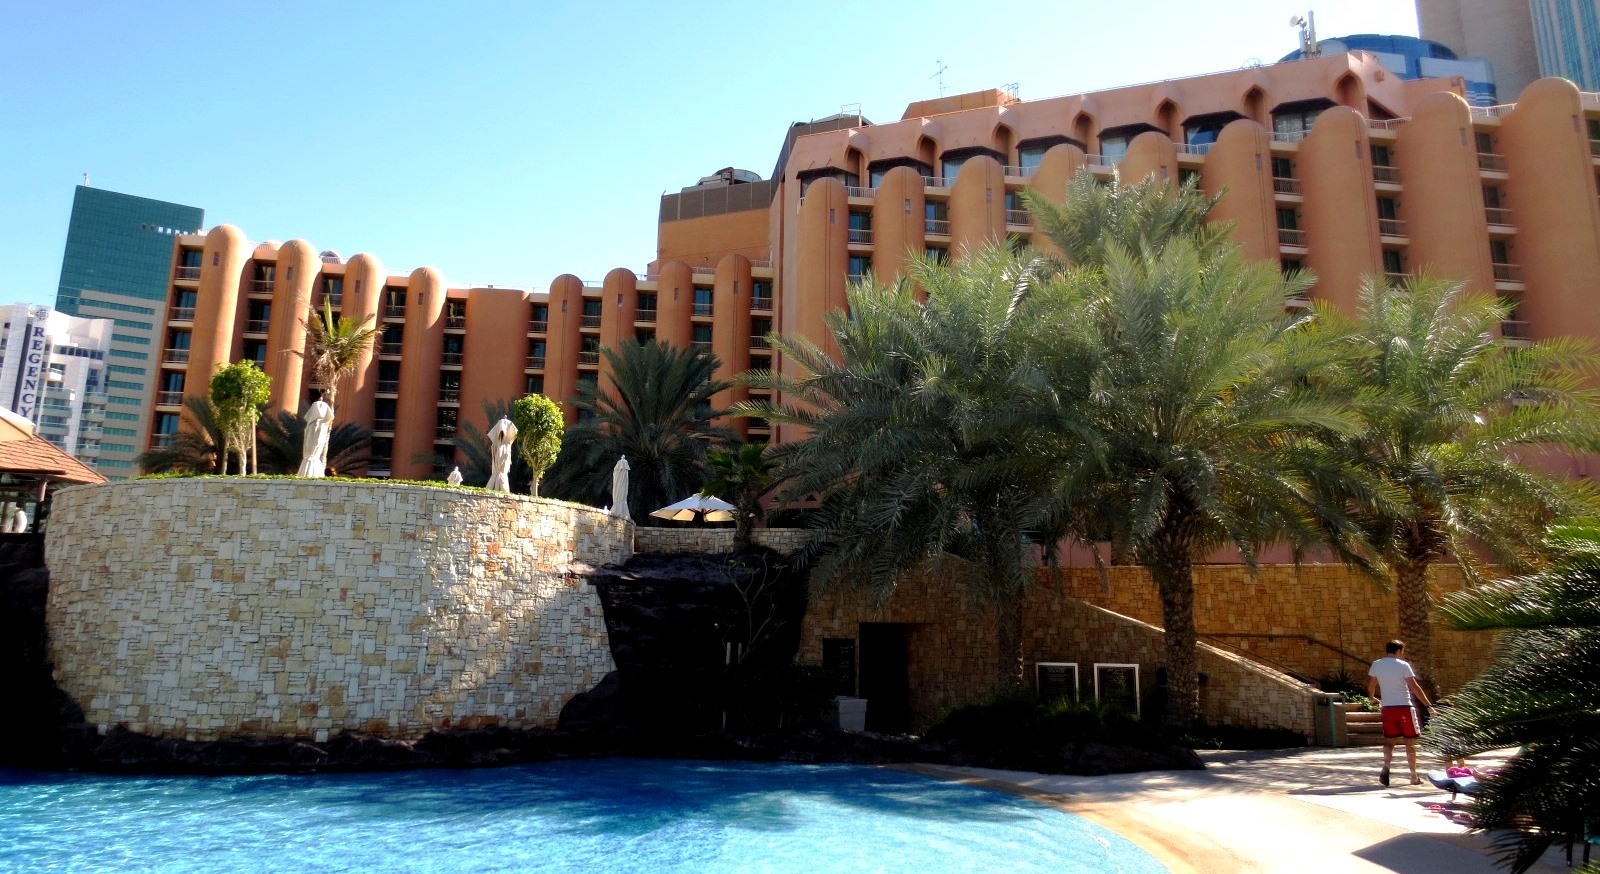 sheraton-hotel-resort-travelgrip